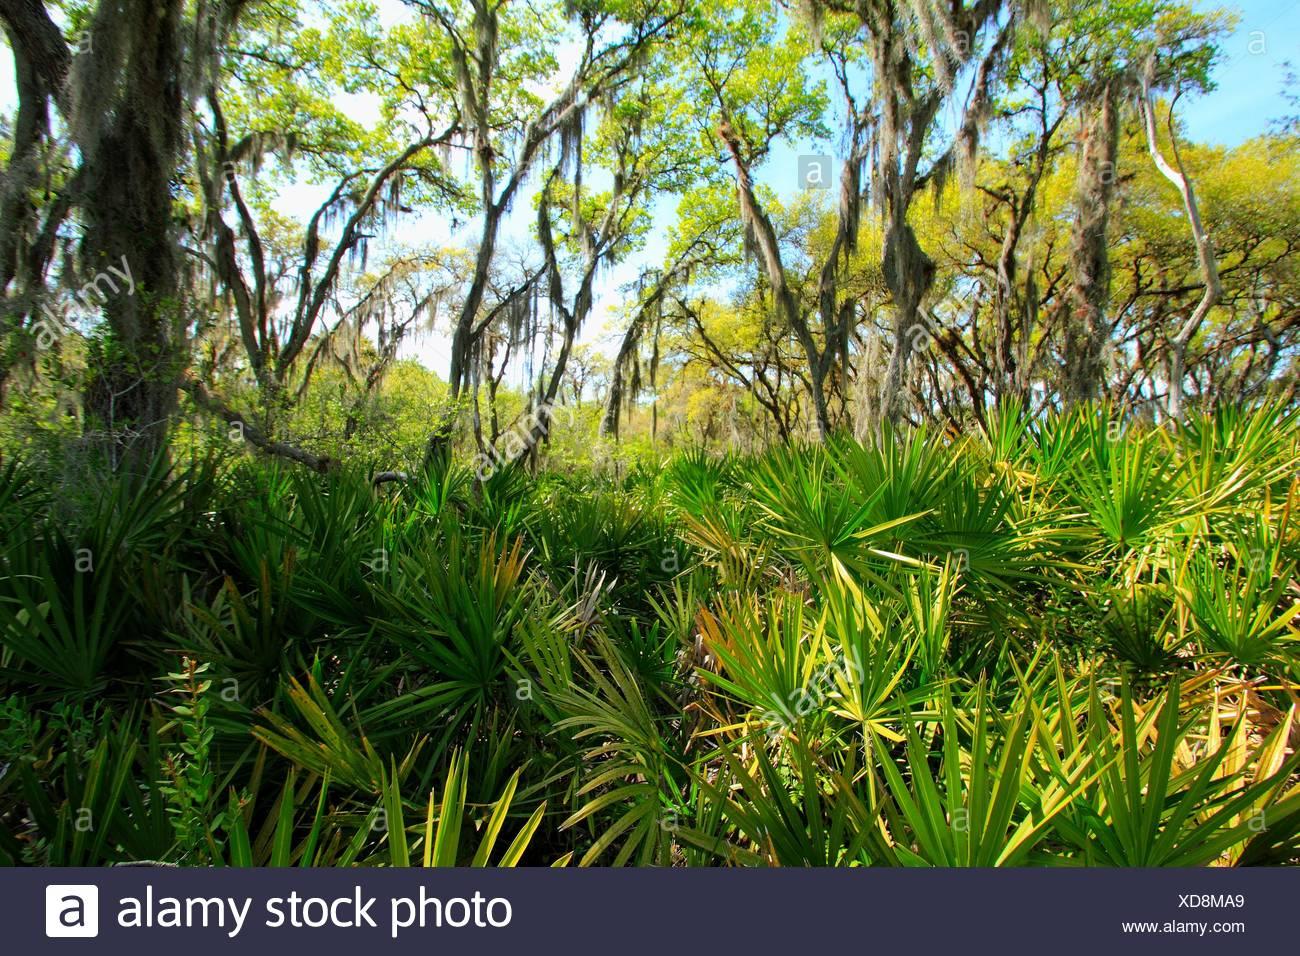 Scrub Palmetto and pine ecosystem. Florida, USA - Stock Image